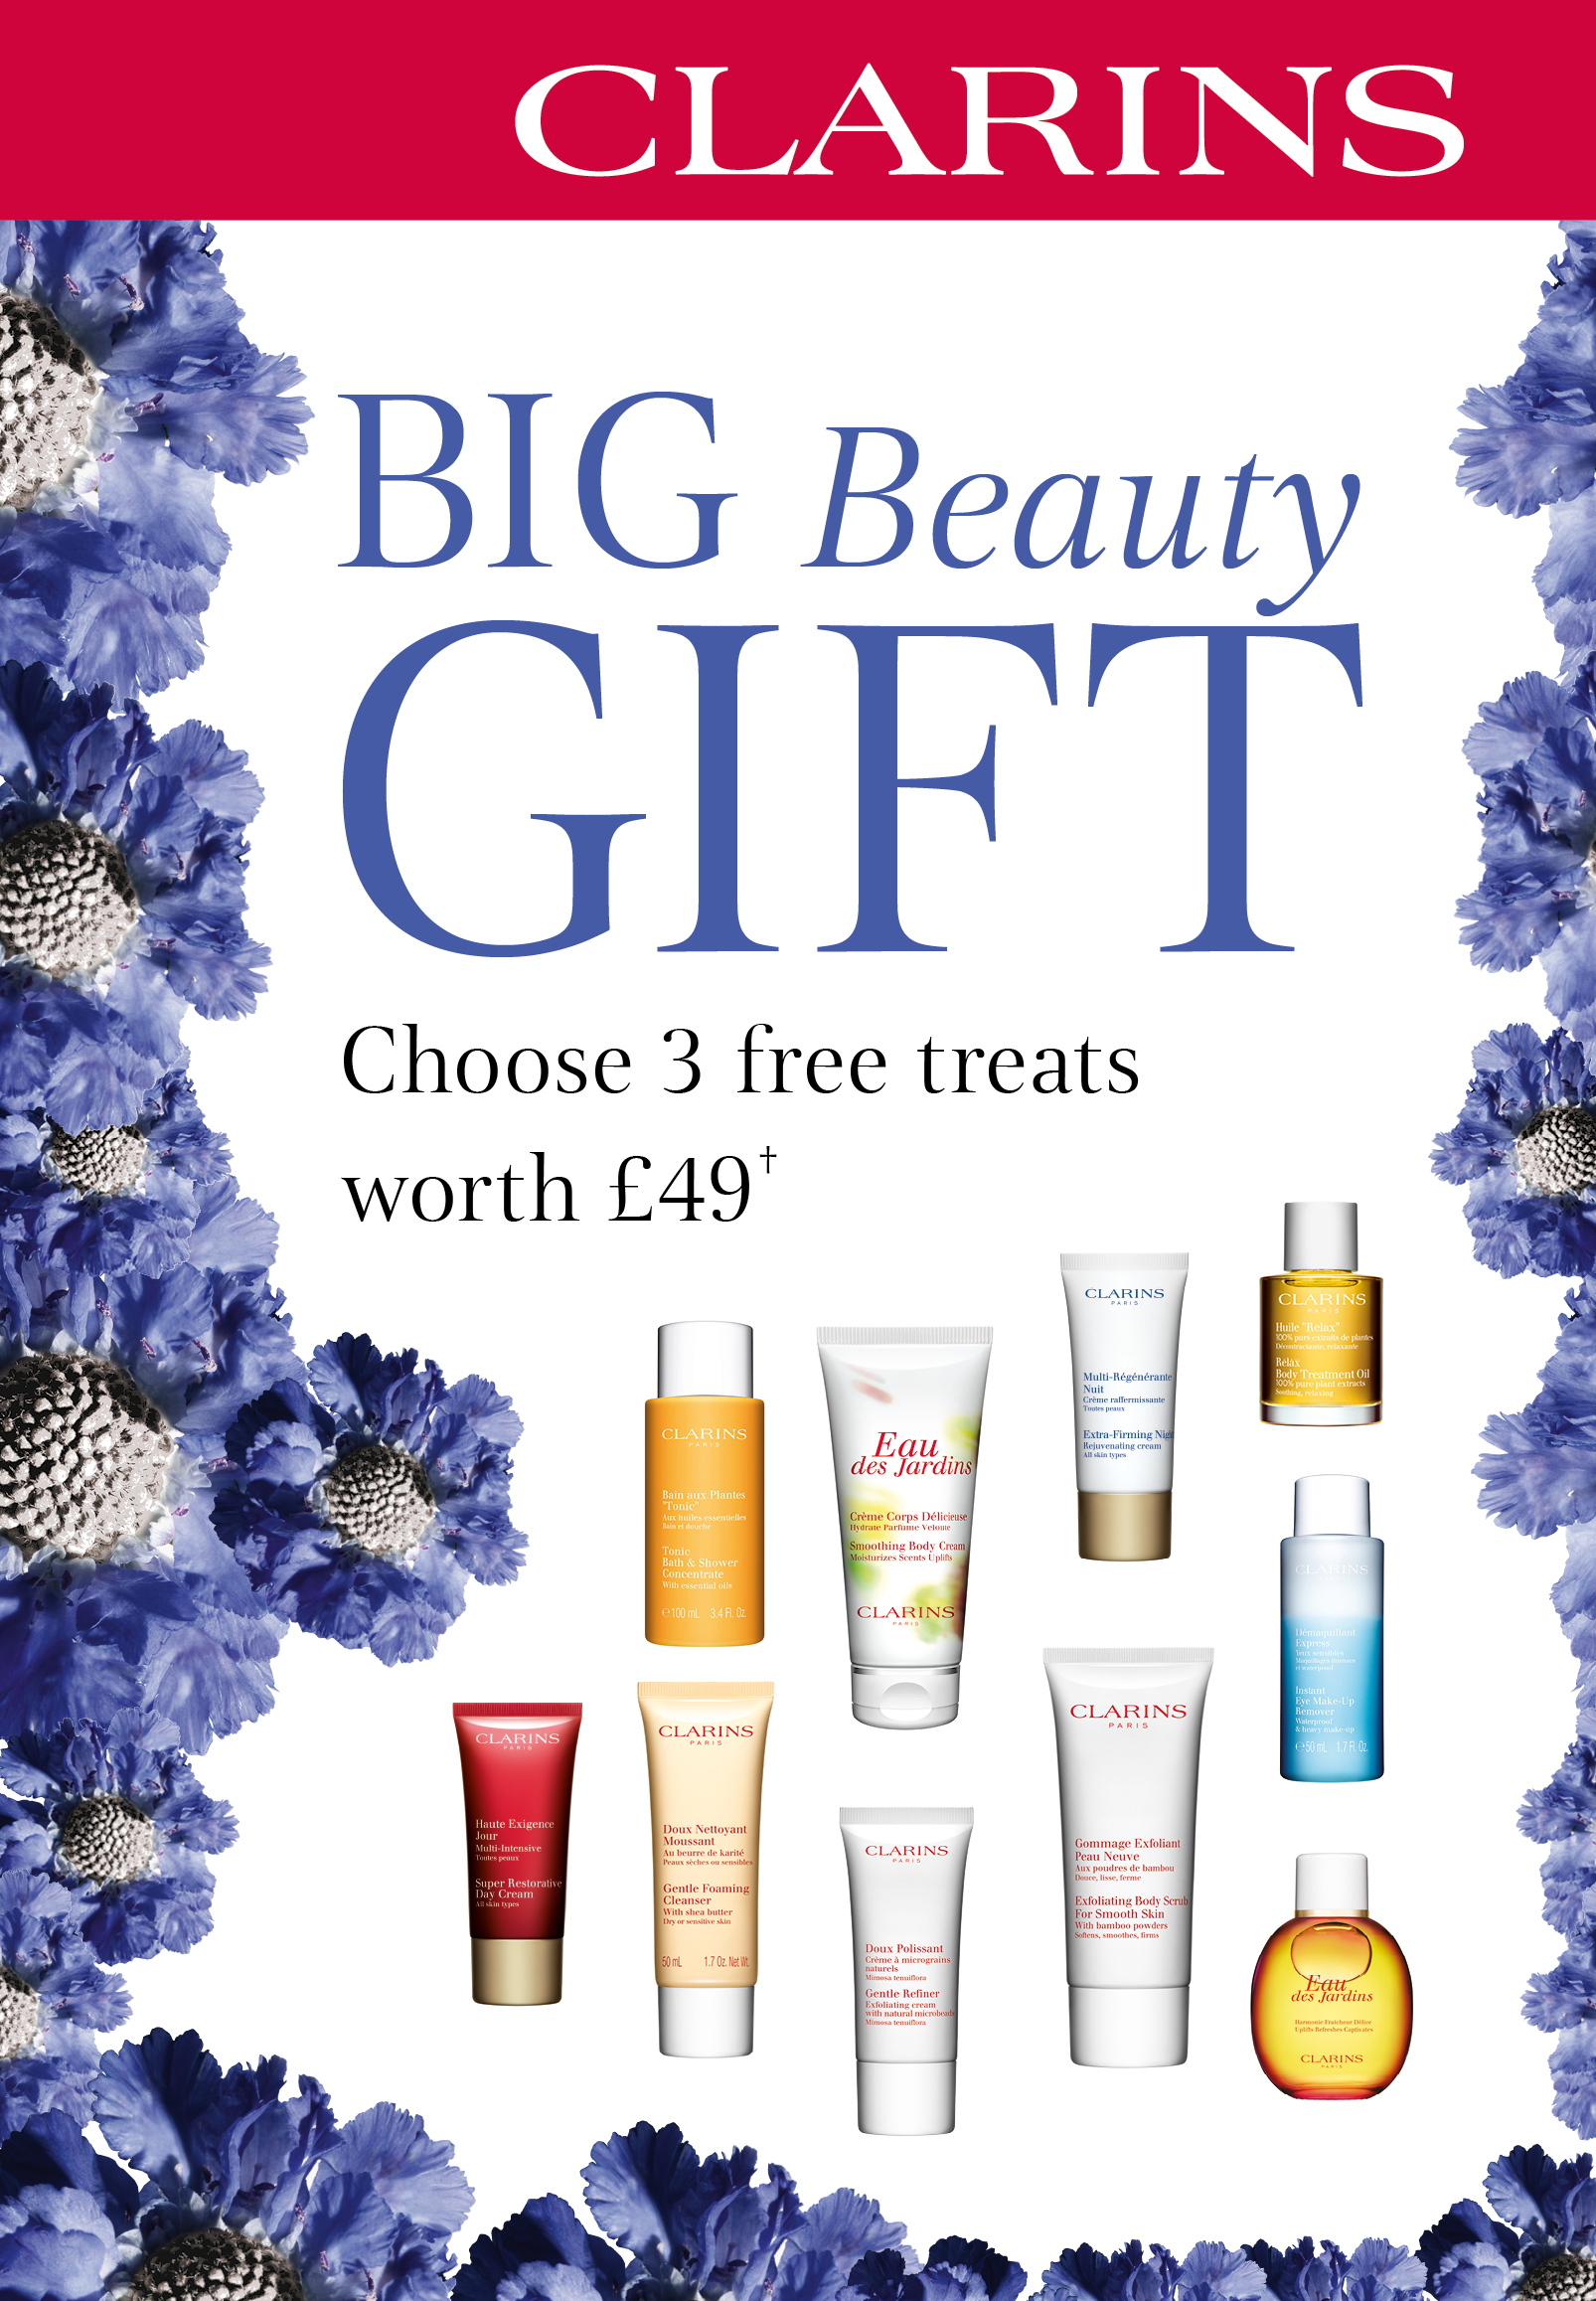 Margaret Balfour Big Beauty Gift Offer